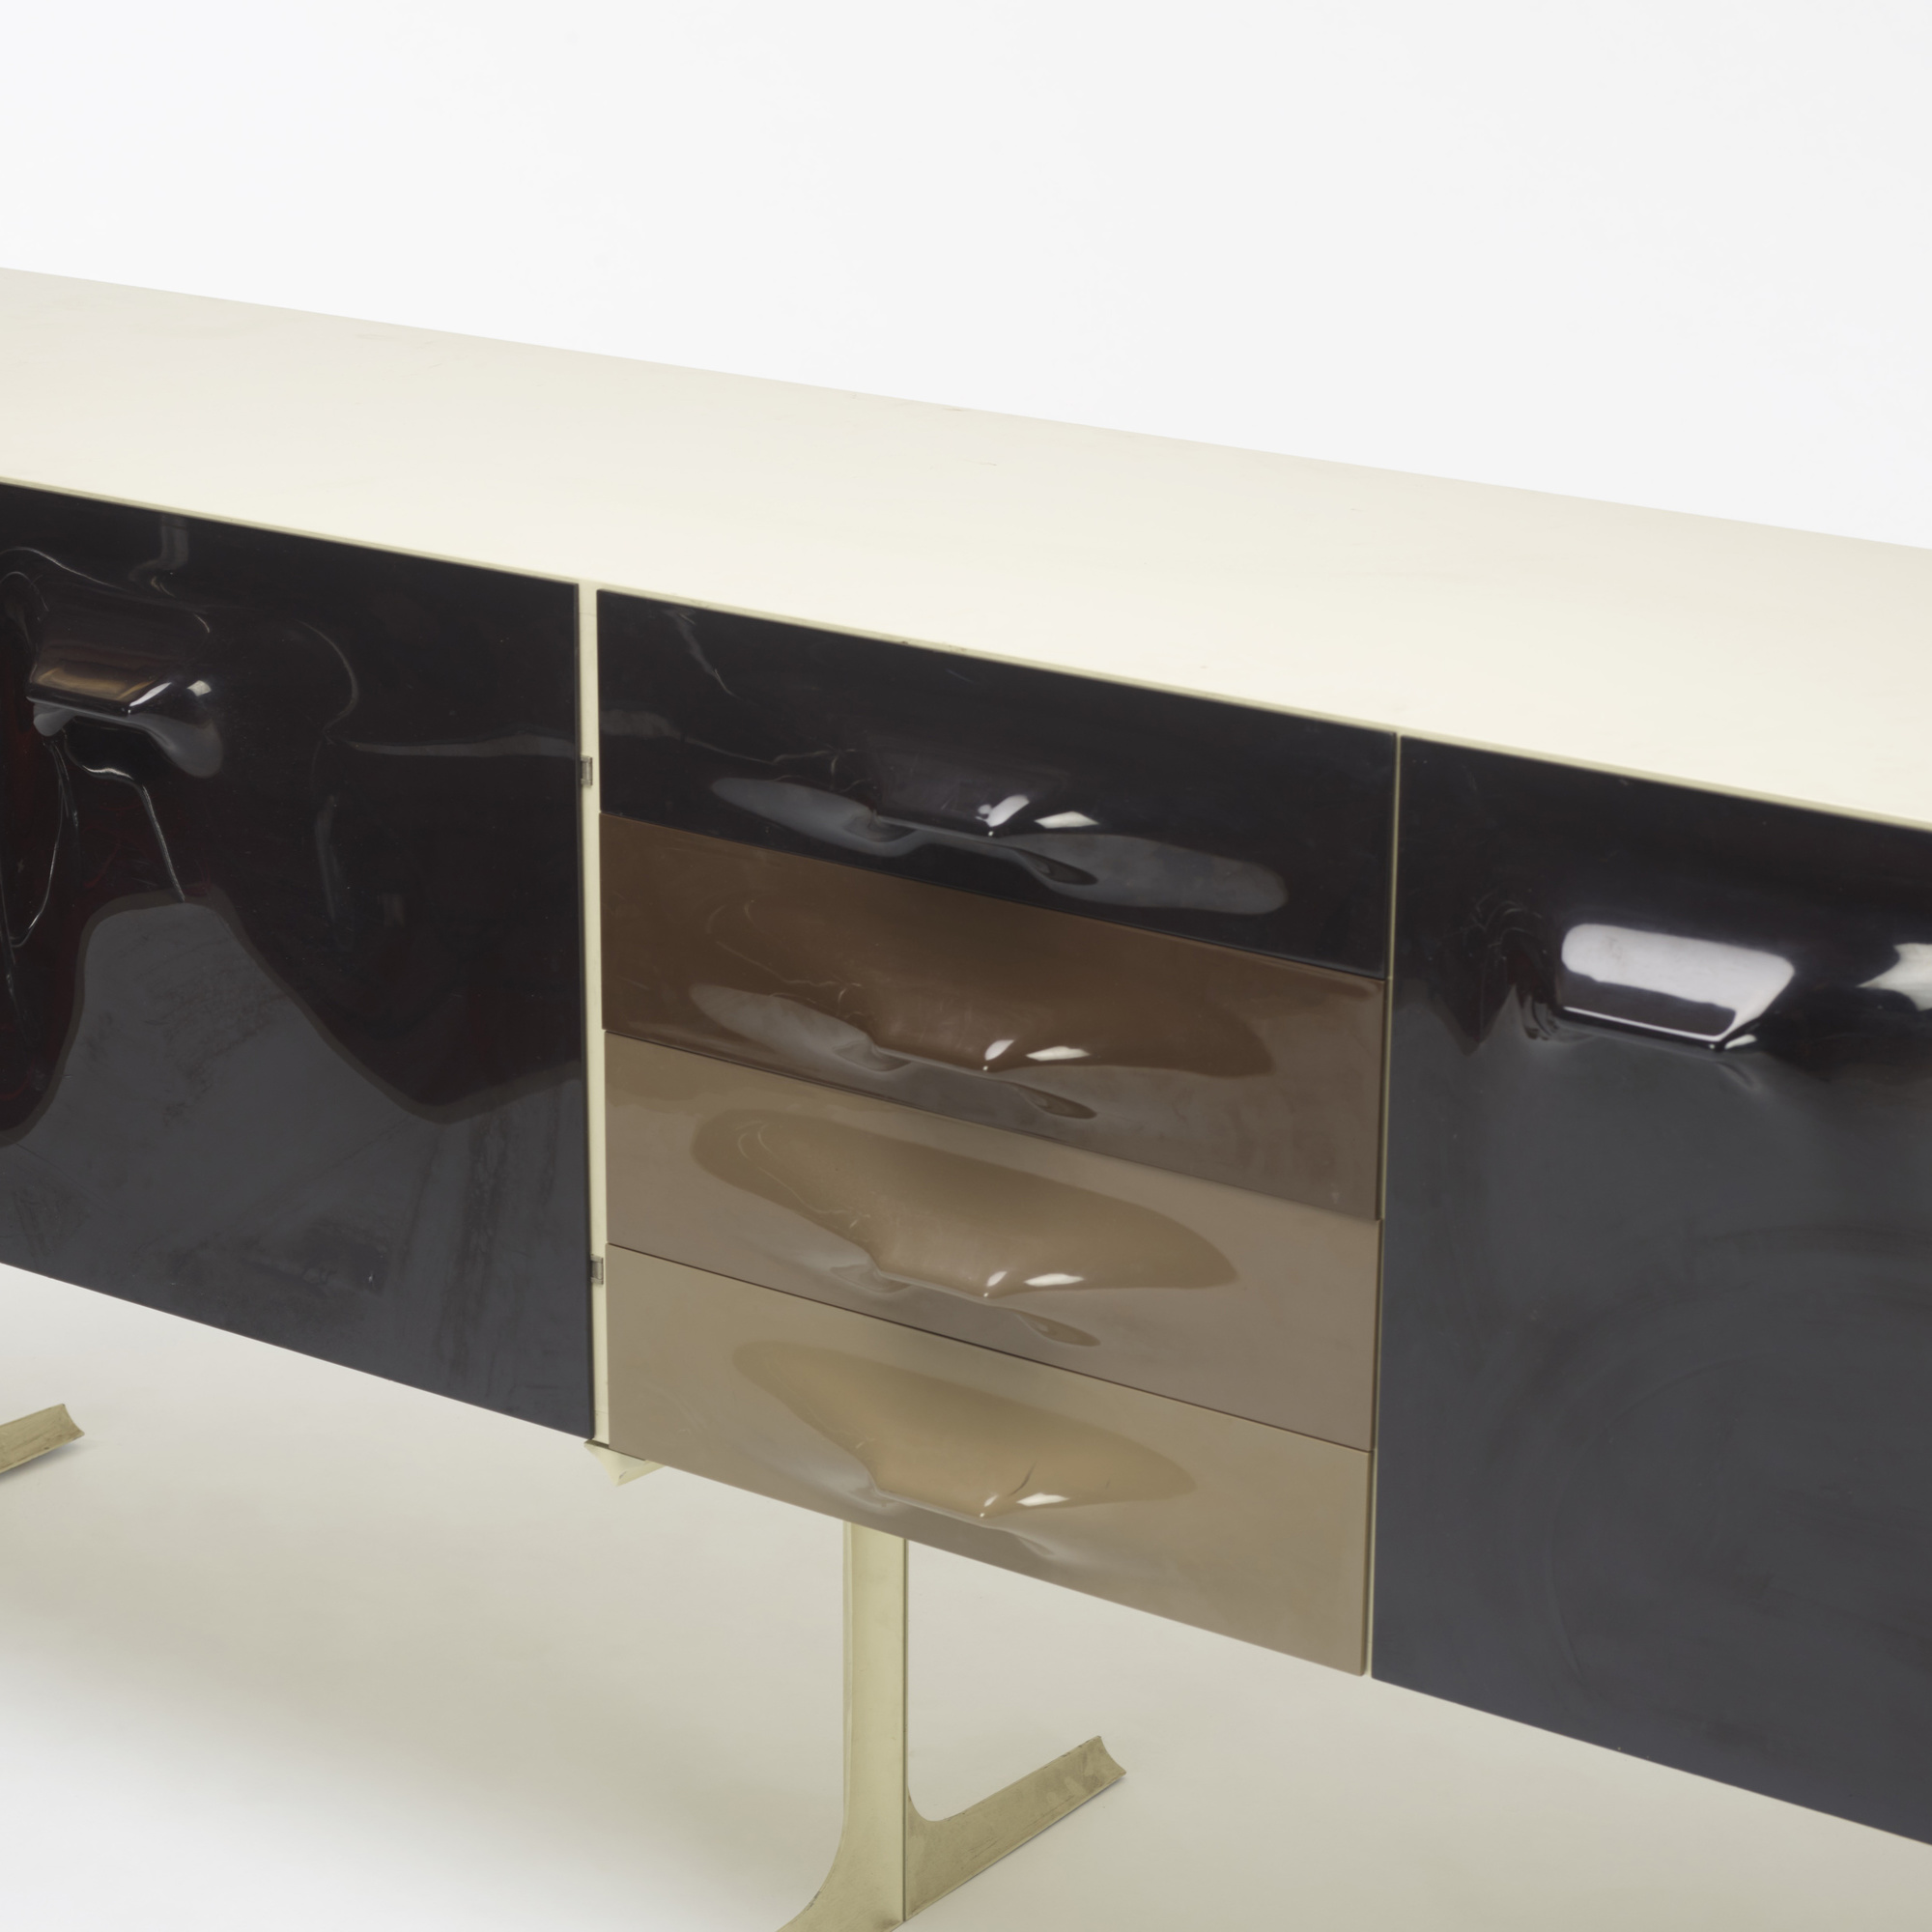 323: Raymond Loewy / DF 2000 cabinet (2 of 3)